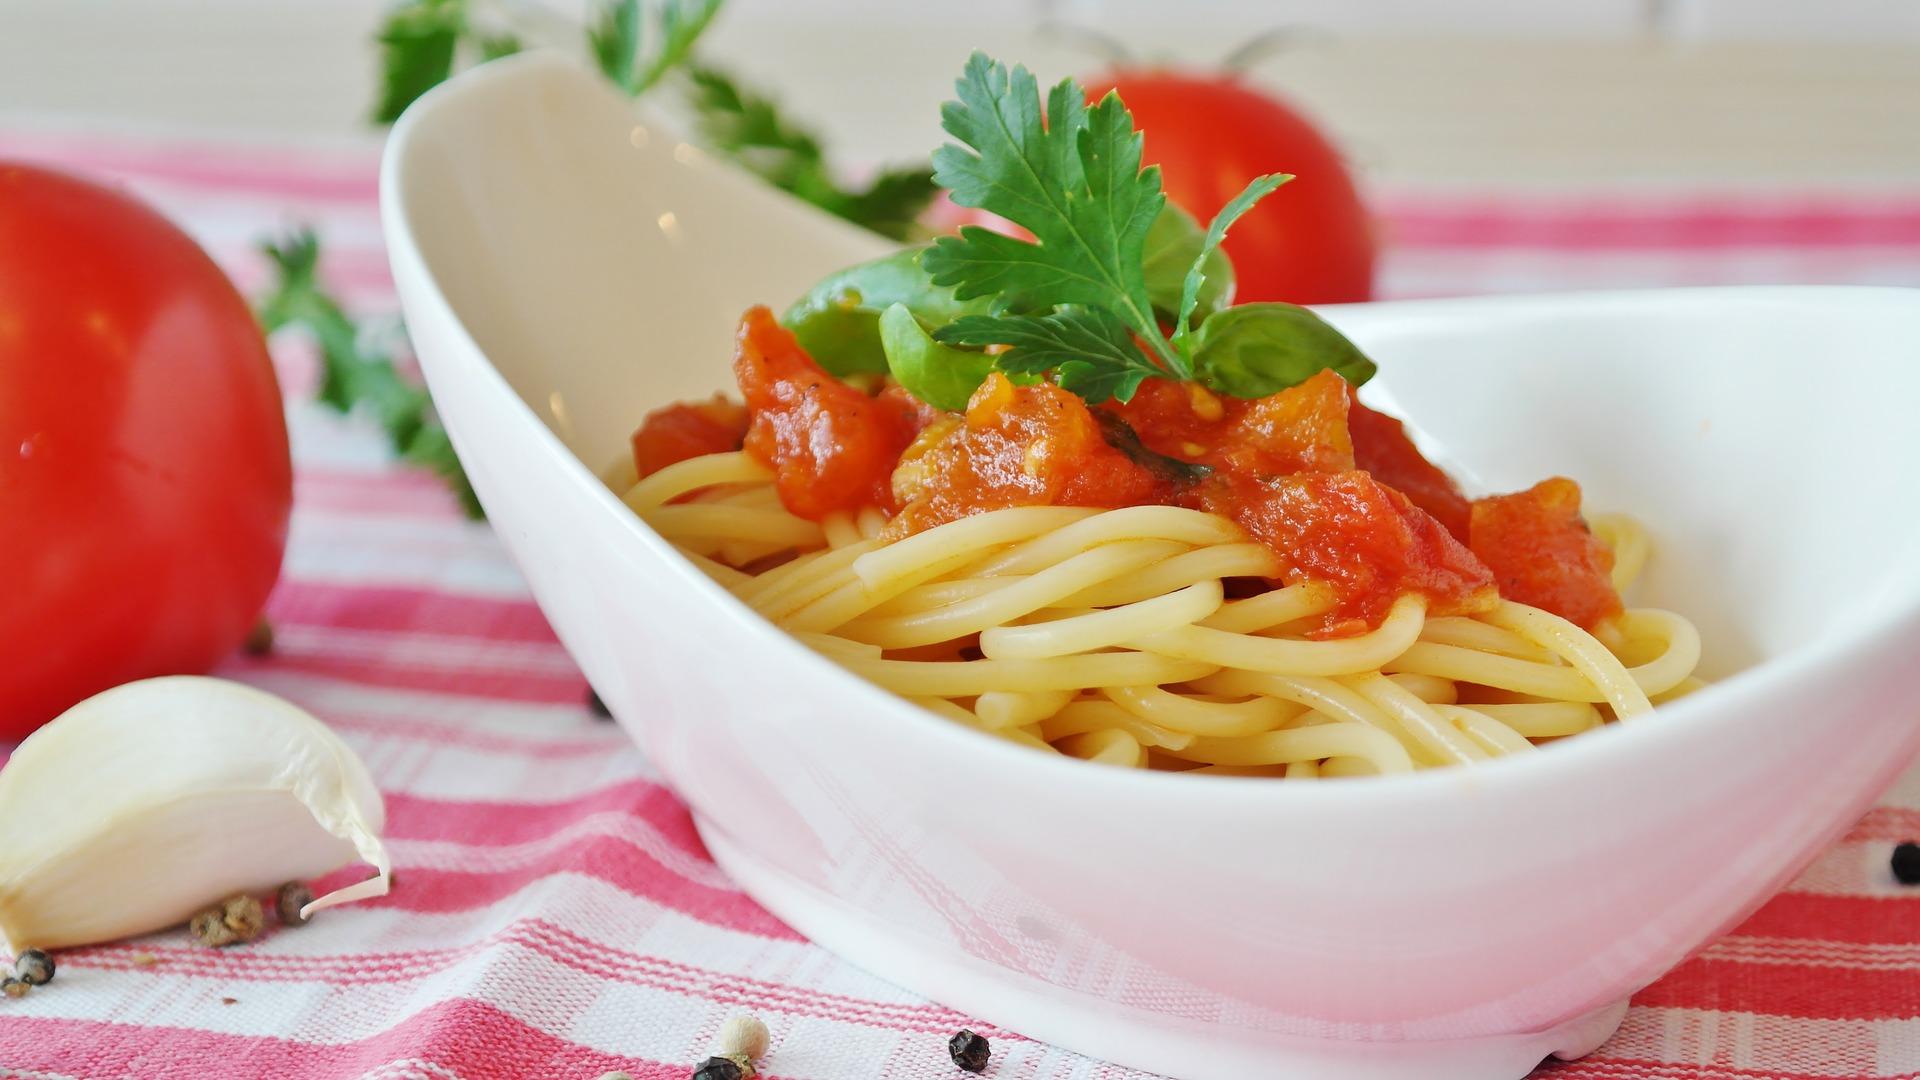 "<a href=""https://www.bnaiisrael.net/event/gan-israel-spaghetti-feed.html""                                     target="""">                                                                 <span class=""slider_title"">                                     Gan Israel Spaghetti Feed                                </span>                                                                 </a>                                                                                                                                                                                       <span class=""slider_description"">Gan Israel invites you to our annual Spaghetti Feed fundraiser on November 2</span>                                                                                     <a href=""https://www.bnaiisrael.net/event/gan-israel-spaghetti-feed.html"" class=""slider_link""                             target="""">                             Read More                            </a>"